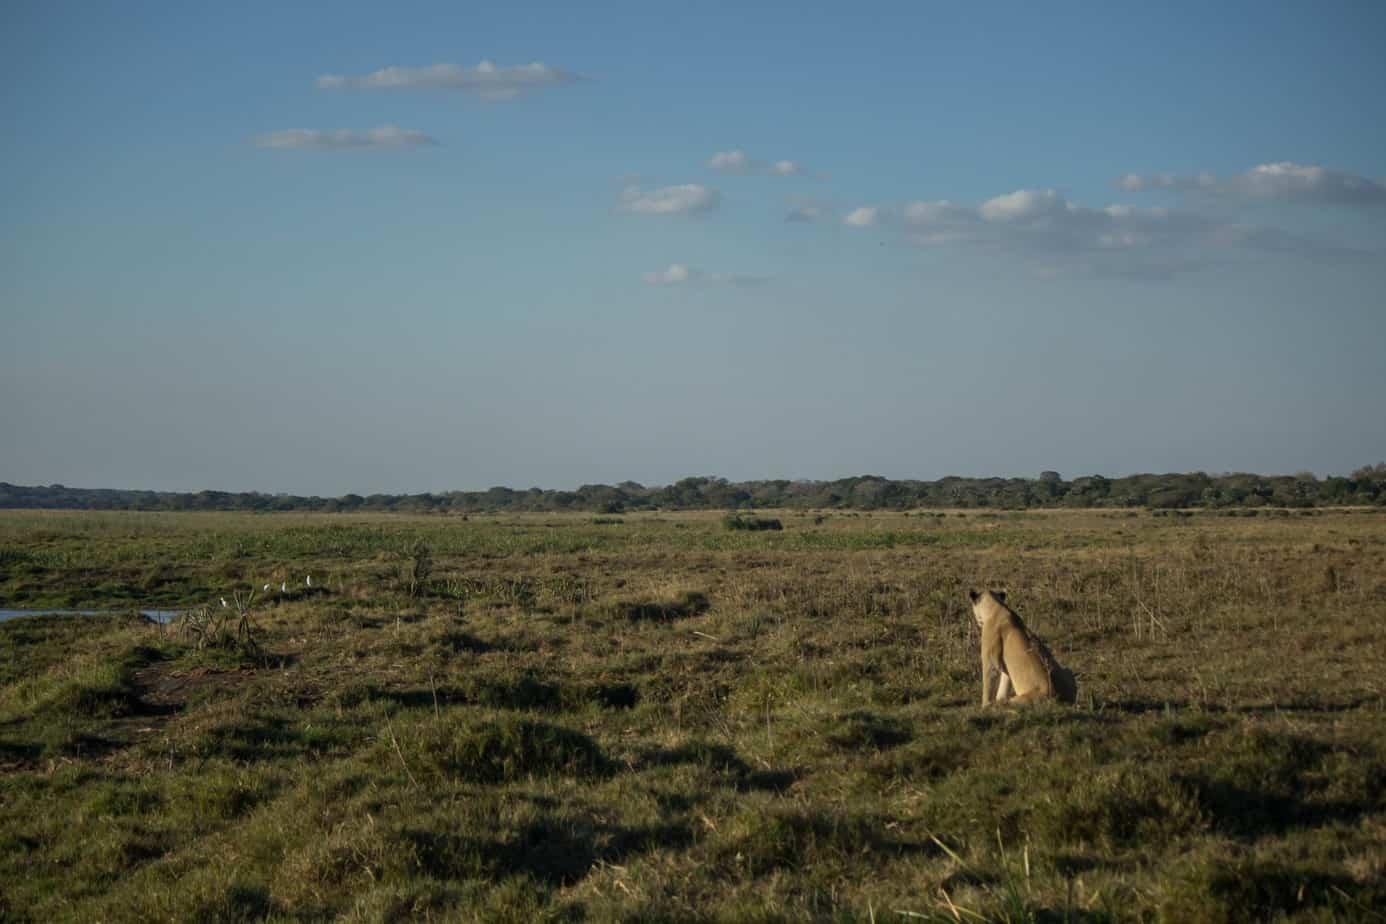 Lioness @ Tembe Elephant Park. Photo: Håvard Rosenlund